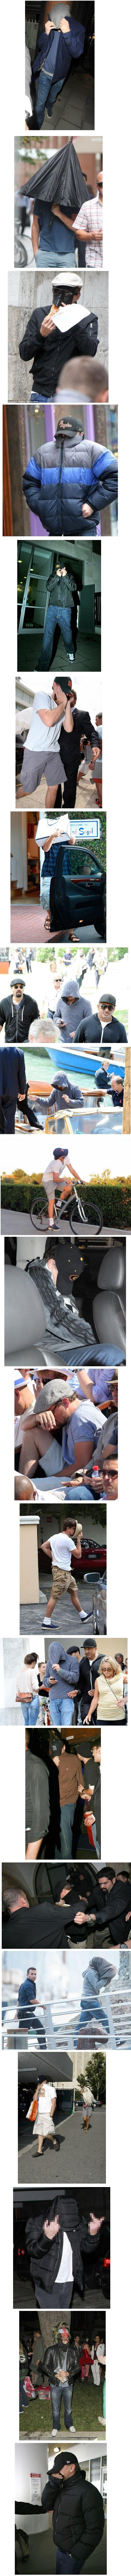 Спрятать лицо от папарацци